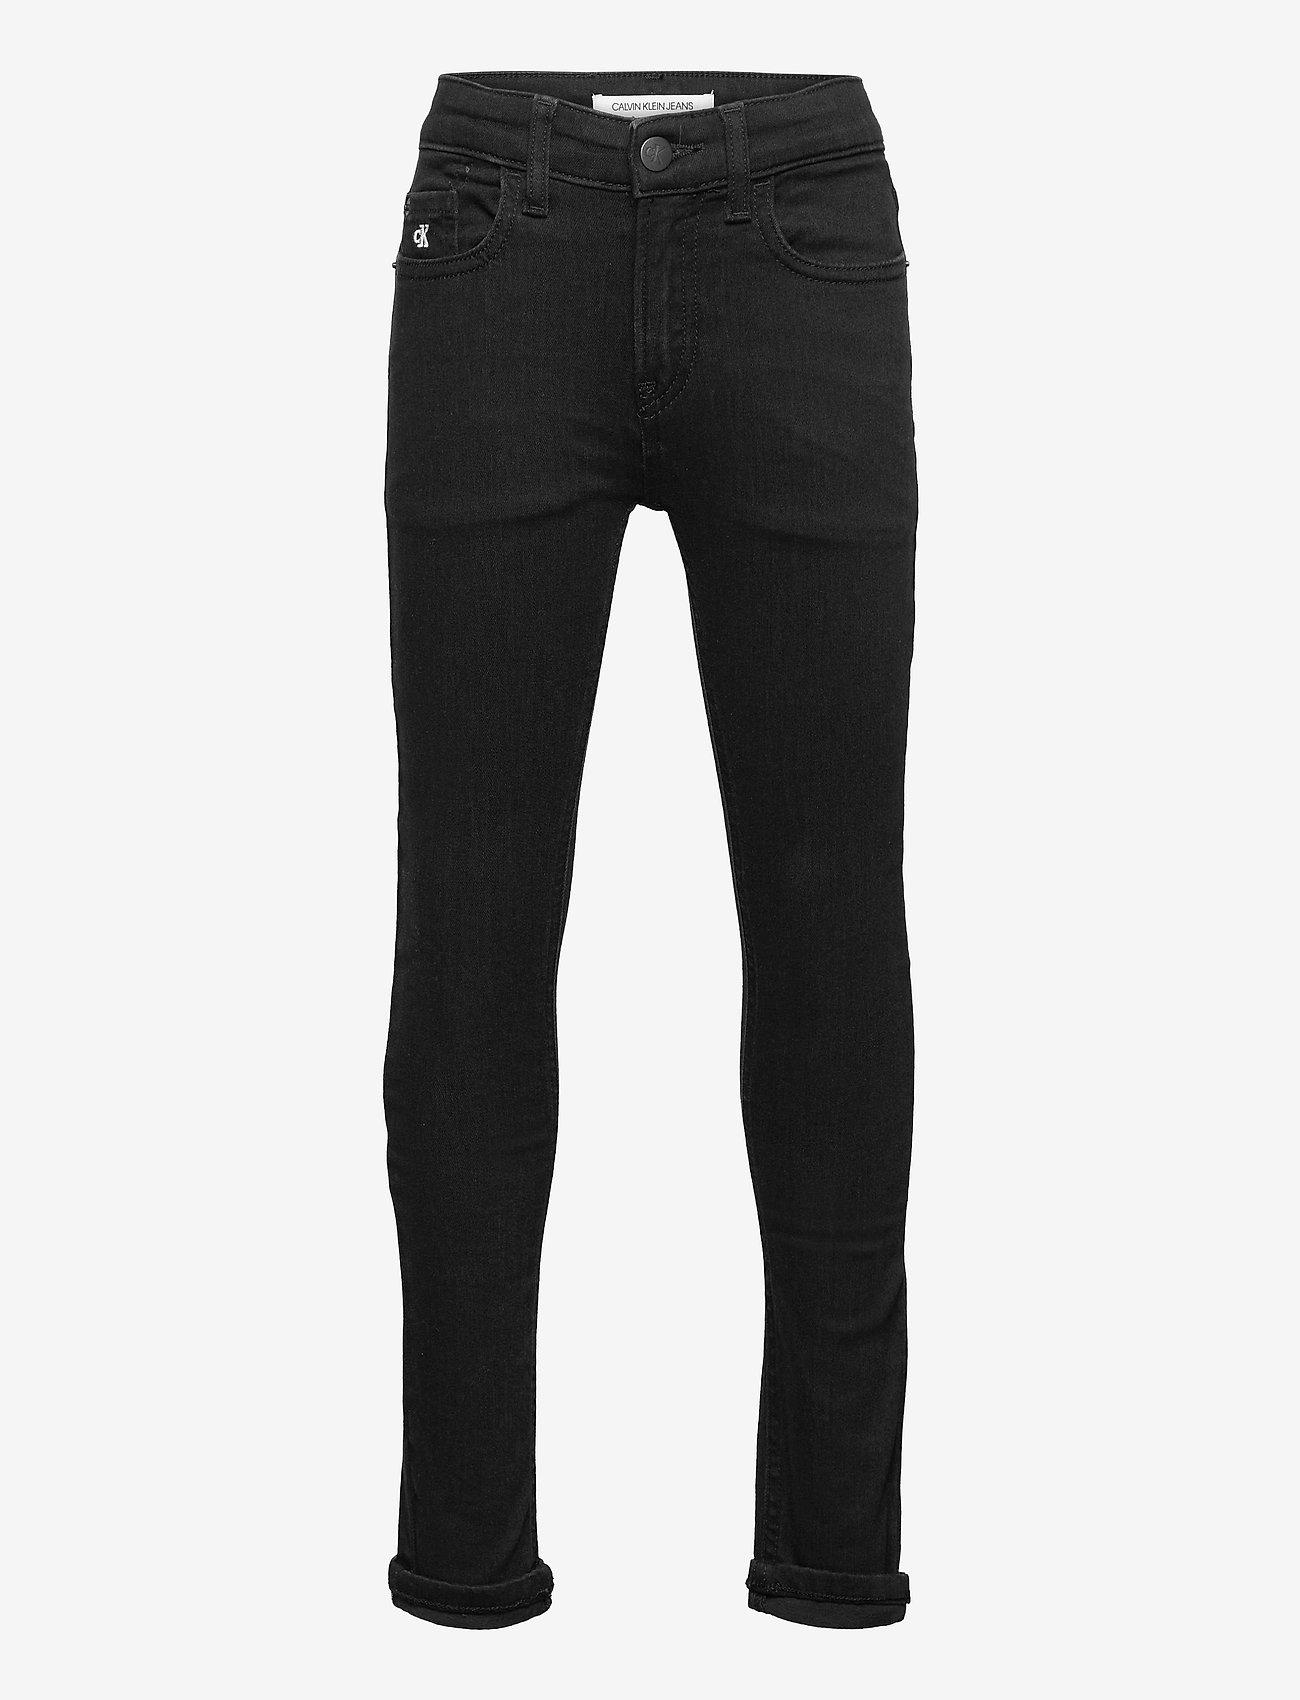 Calvin Klein - SKINNY CL BLK STR - jeans - clean black stretch - 0